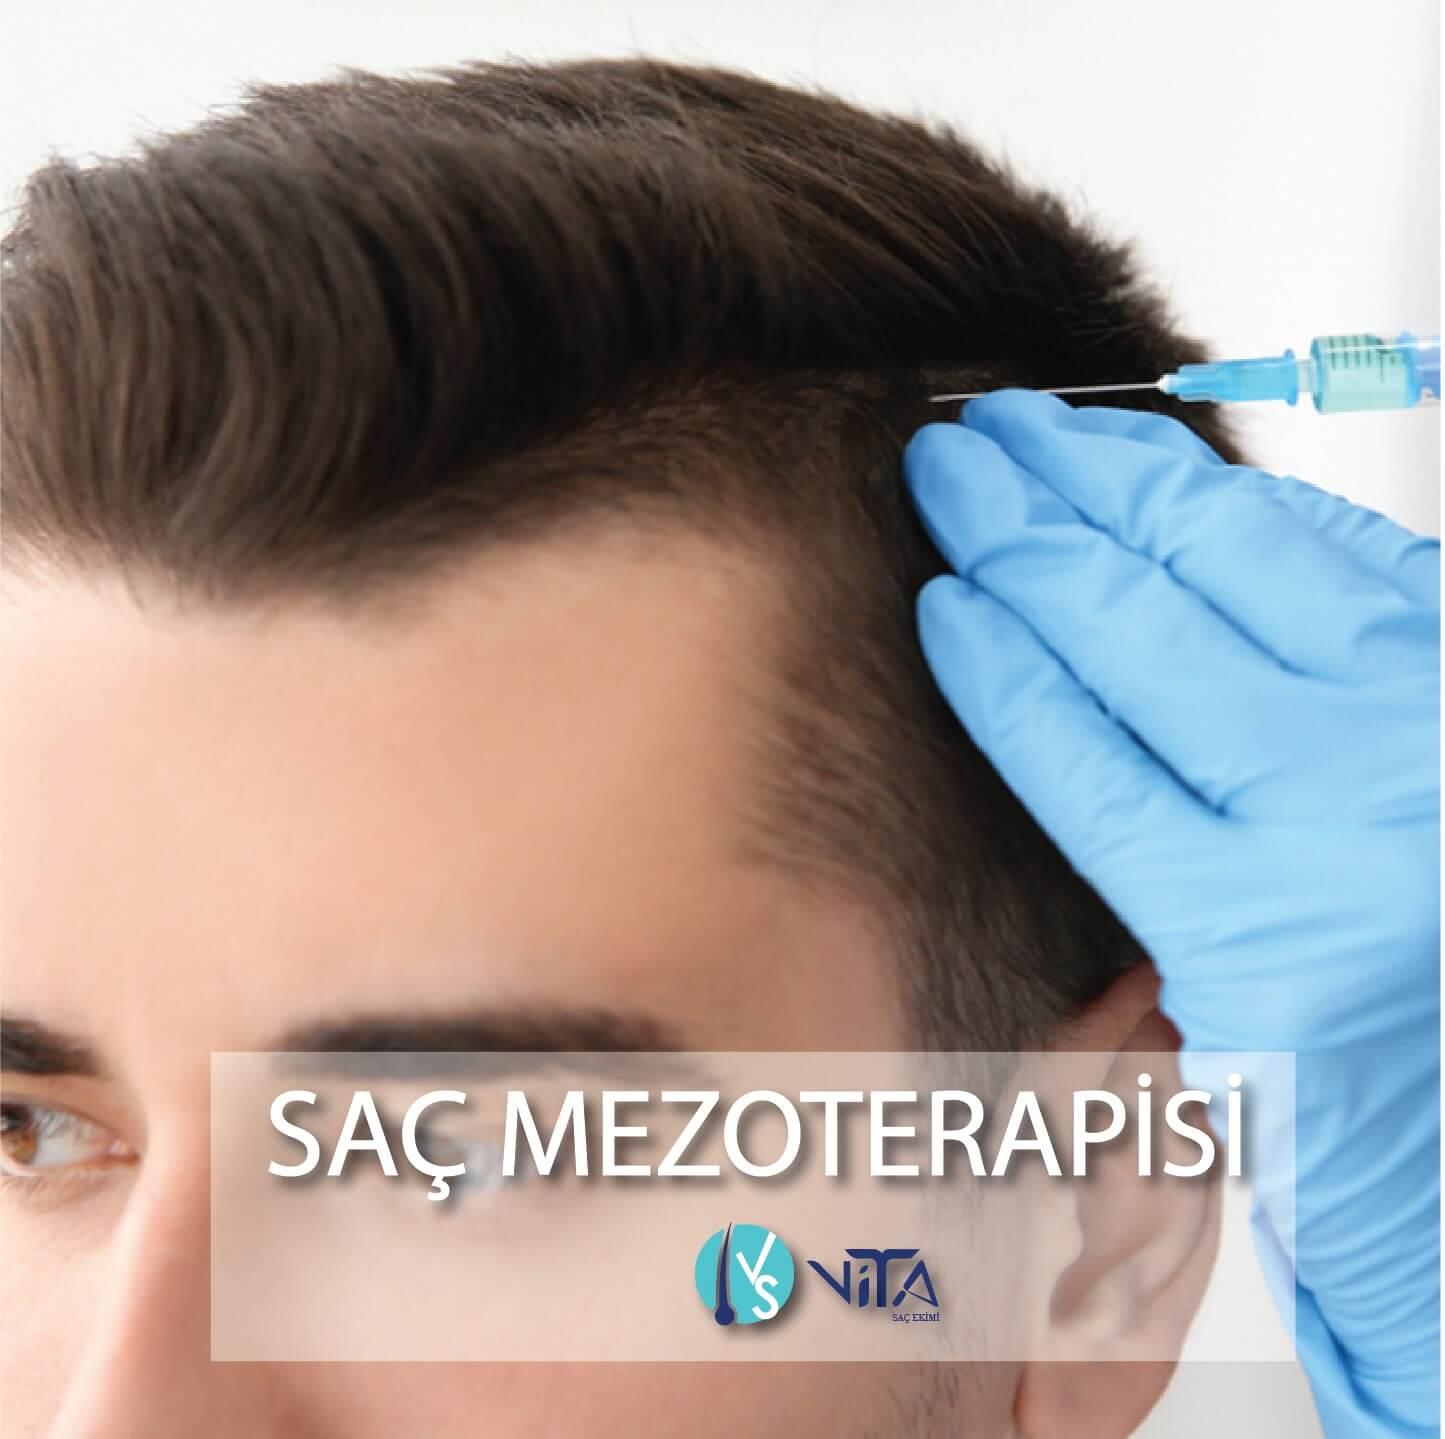 Saç Mezoterapisi - Saç Ekimi PRP Tedavisi